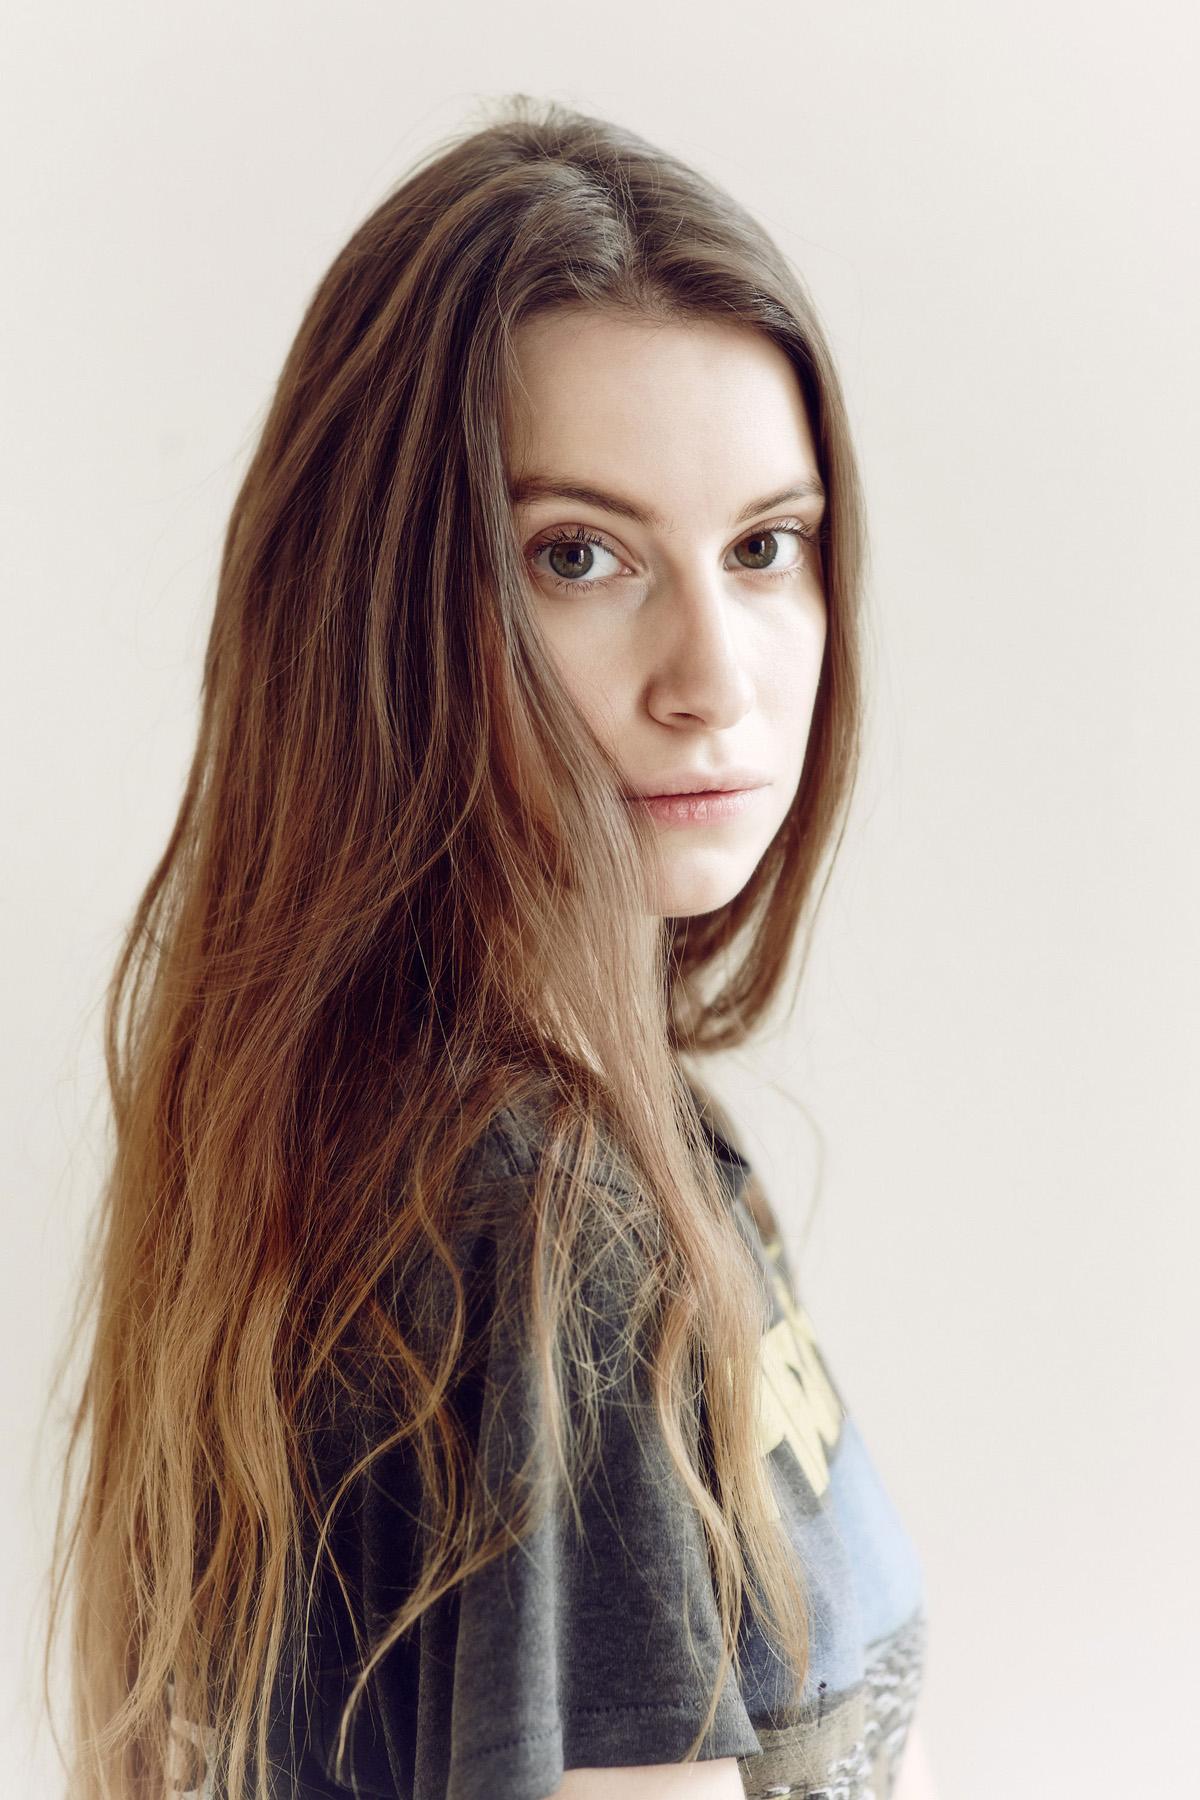 Lea-Meienberg Nina Portrait